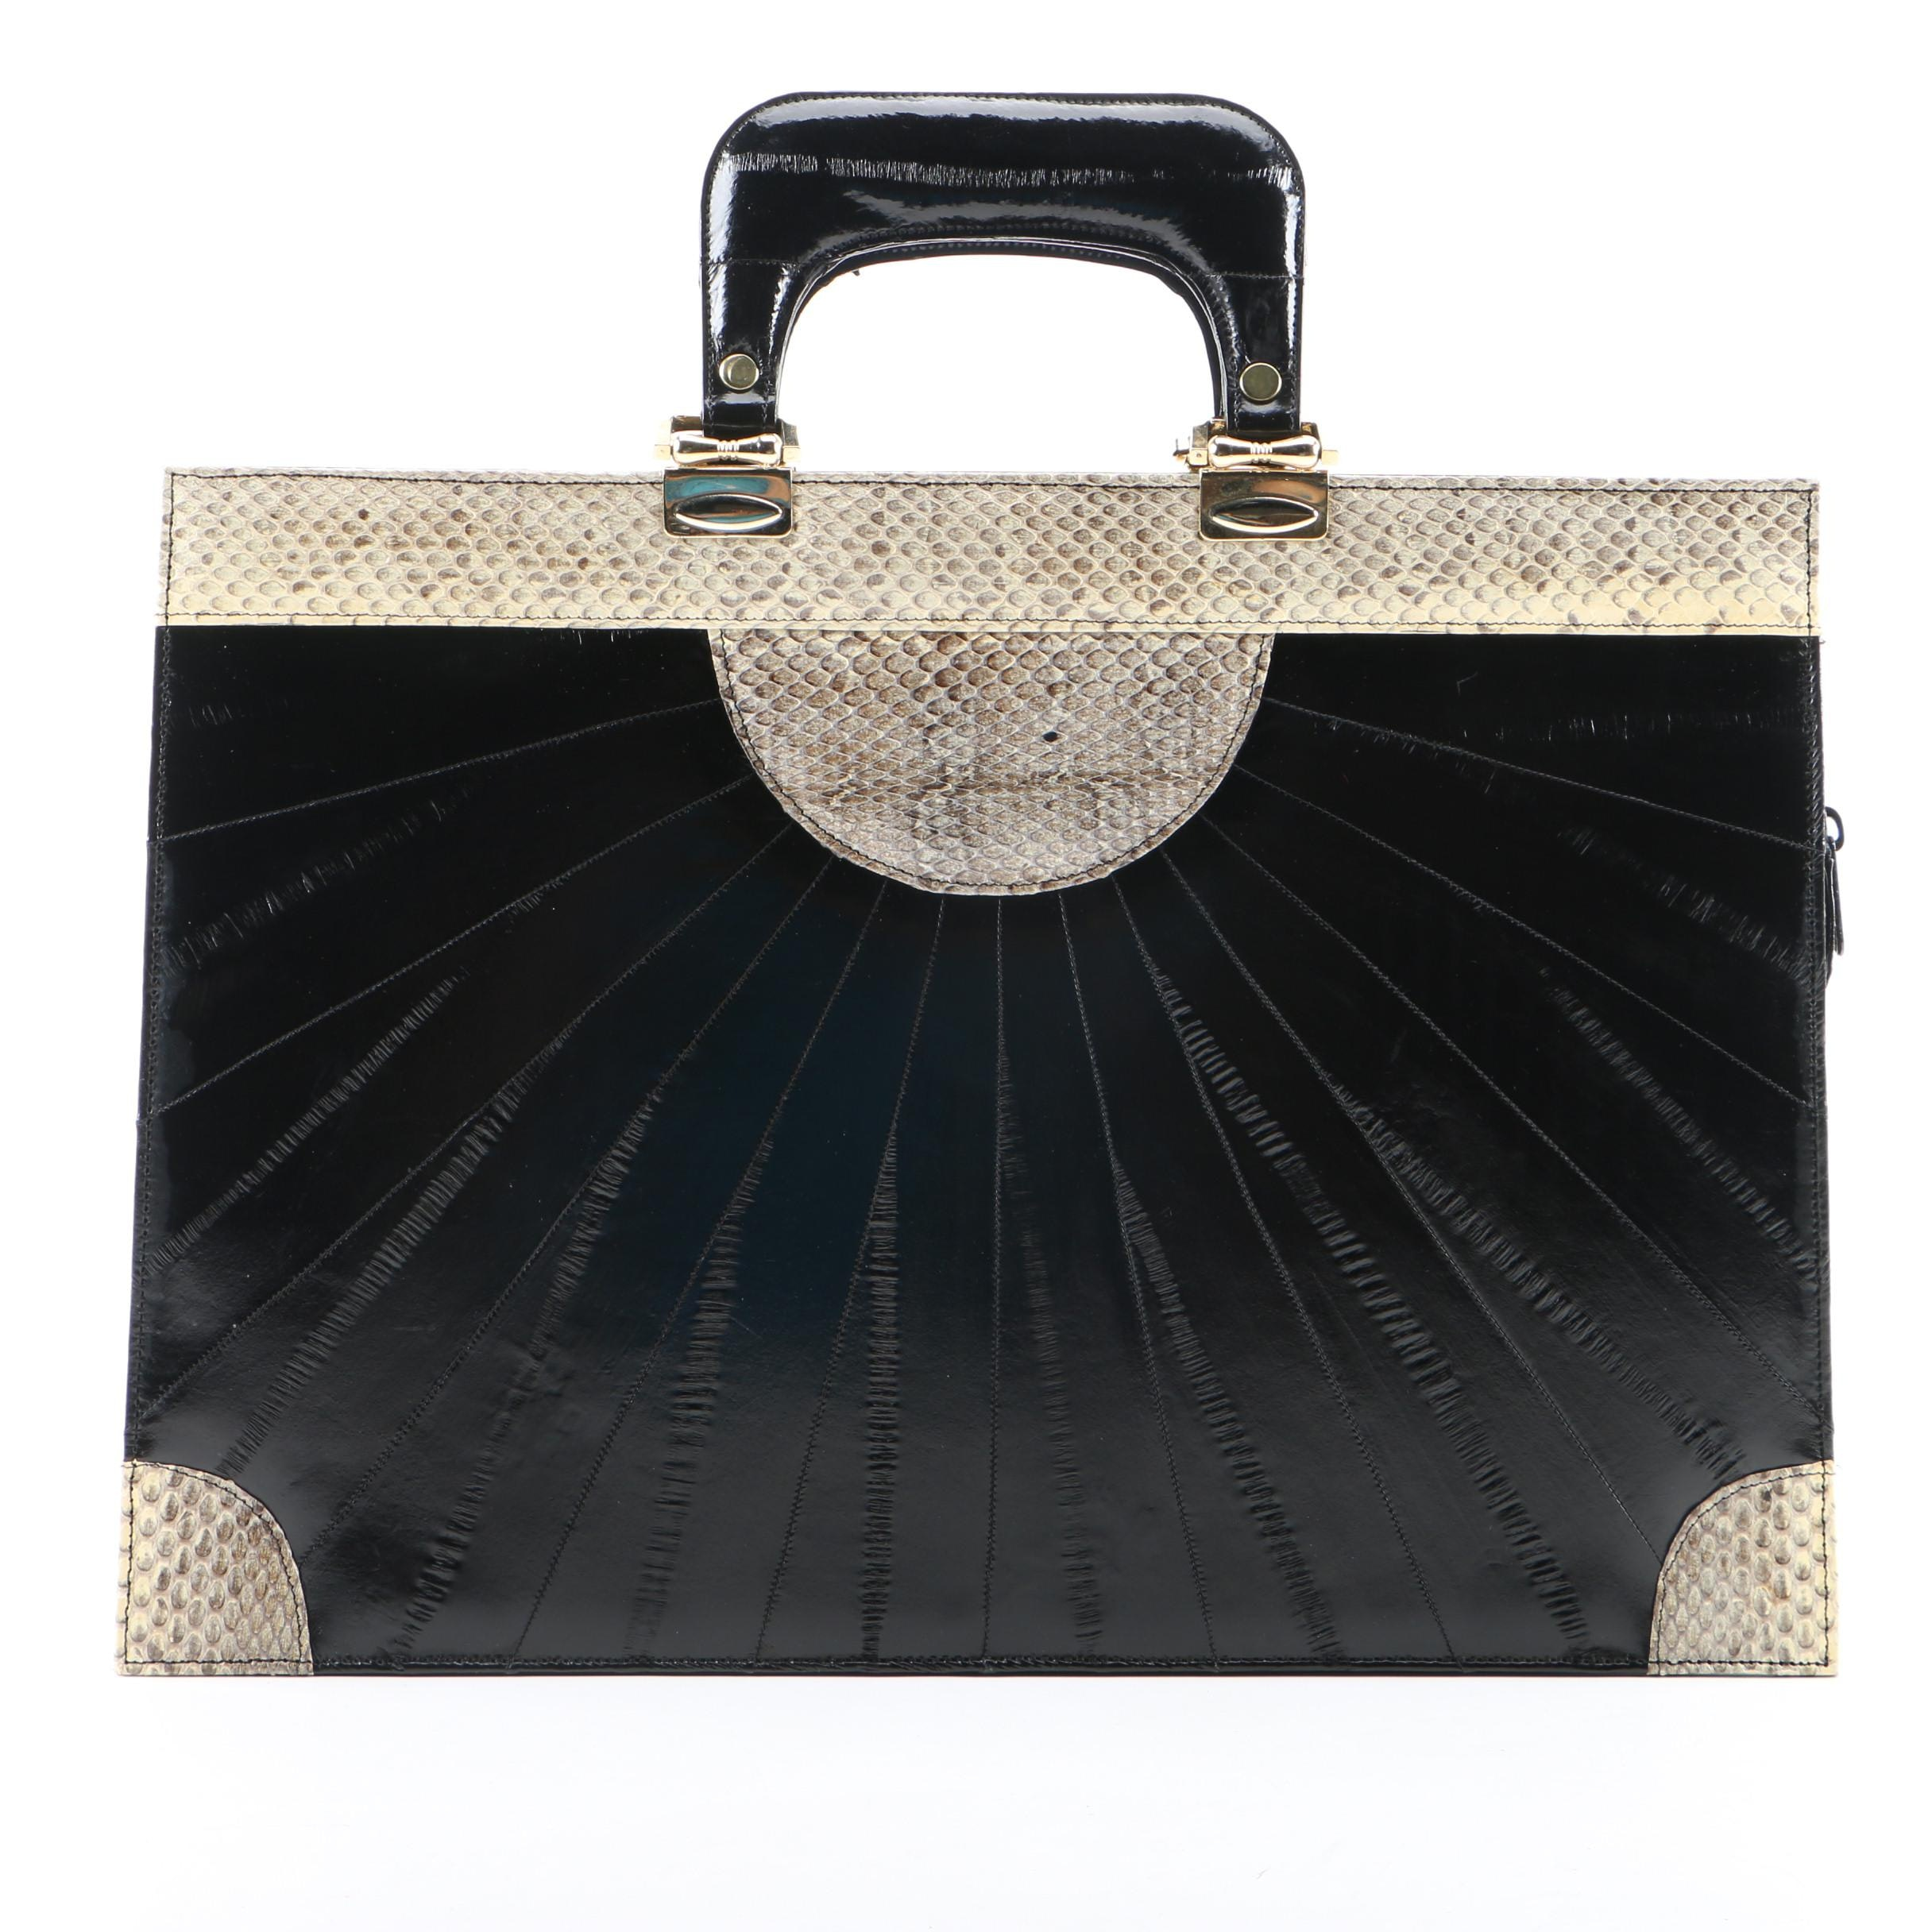 Vintage Èlan of California Black Eel Skin and Snakeskin Briefcase